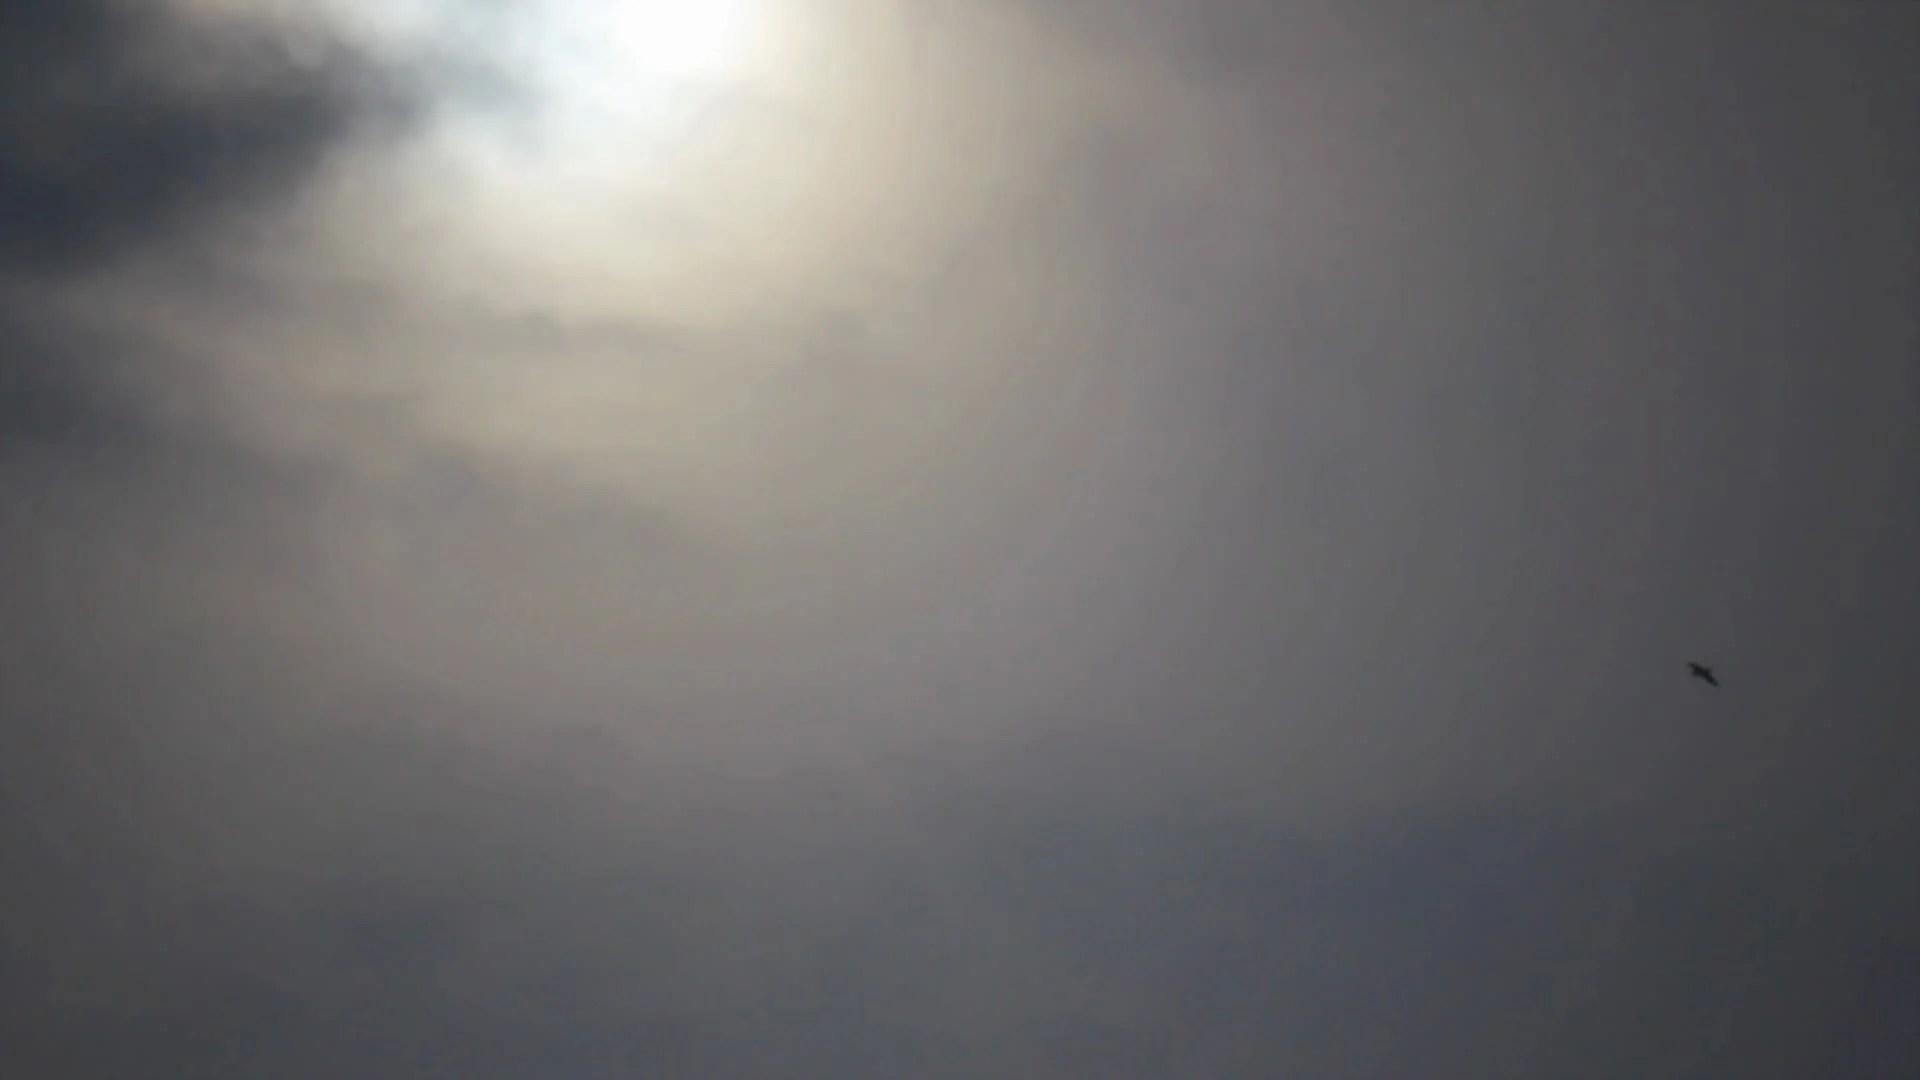 Custom Anime Wallpaper Birds Silhouette On Sunlight On The Background Grey Misty